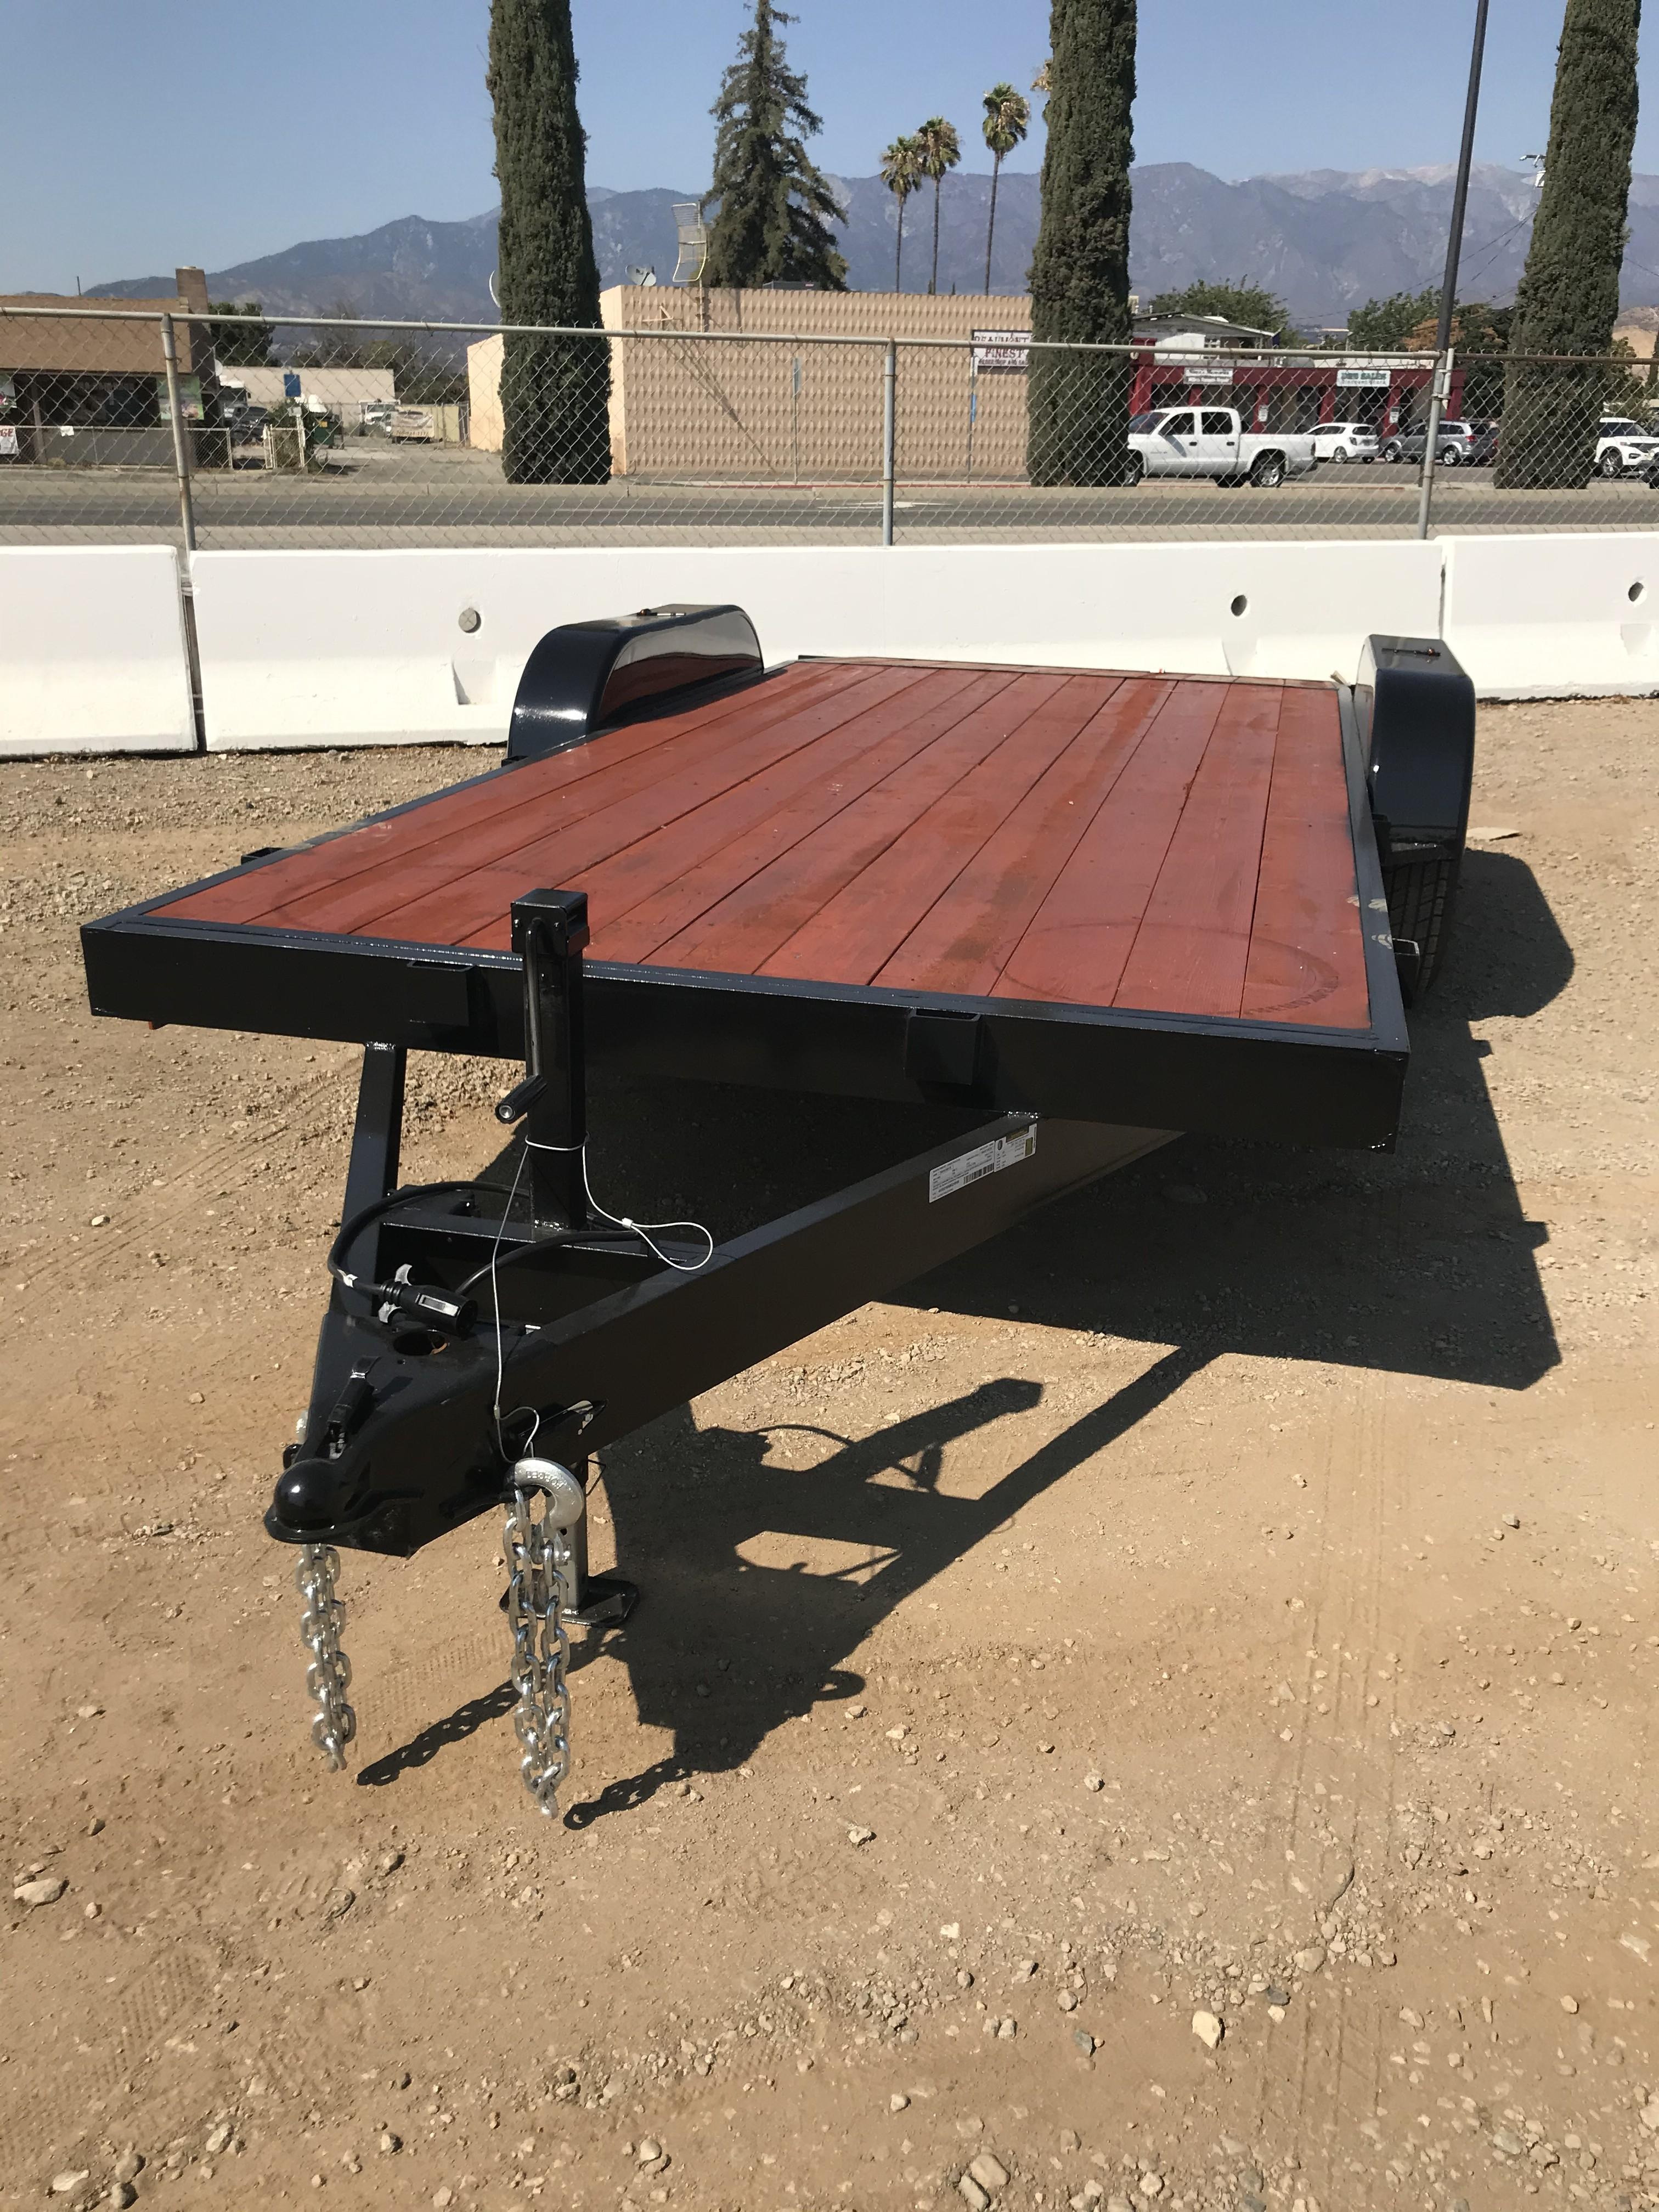 New, 2021, Carson Trailer, 18' Heavy Duty Black Car Hauler in Beaumont, CA, Car Carrier Trailers